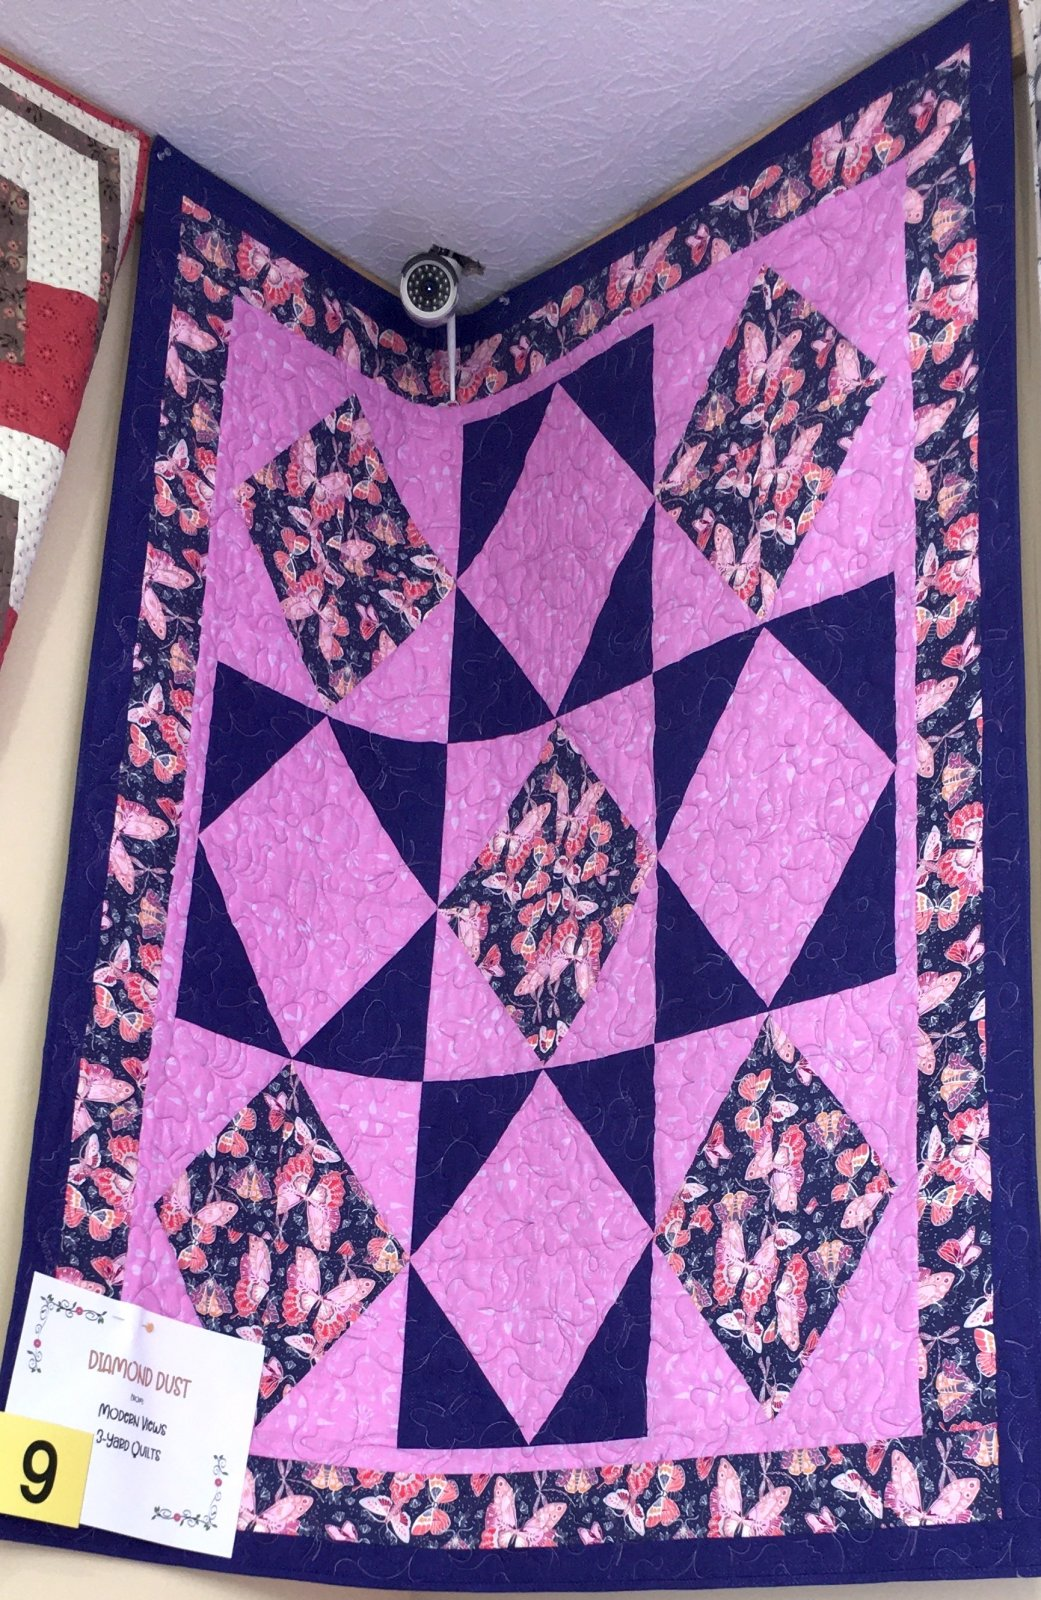 Diamond Dust Fabric Kit #9